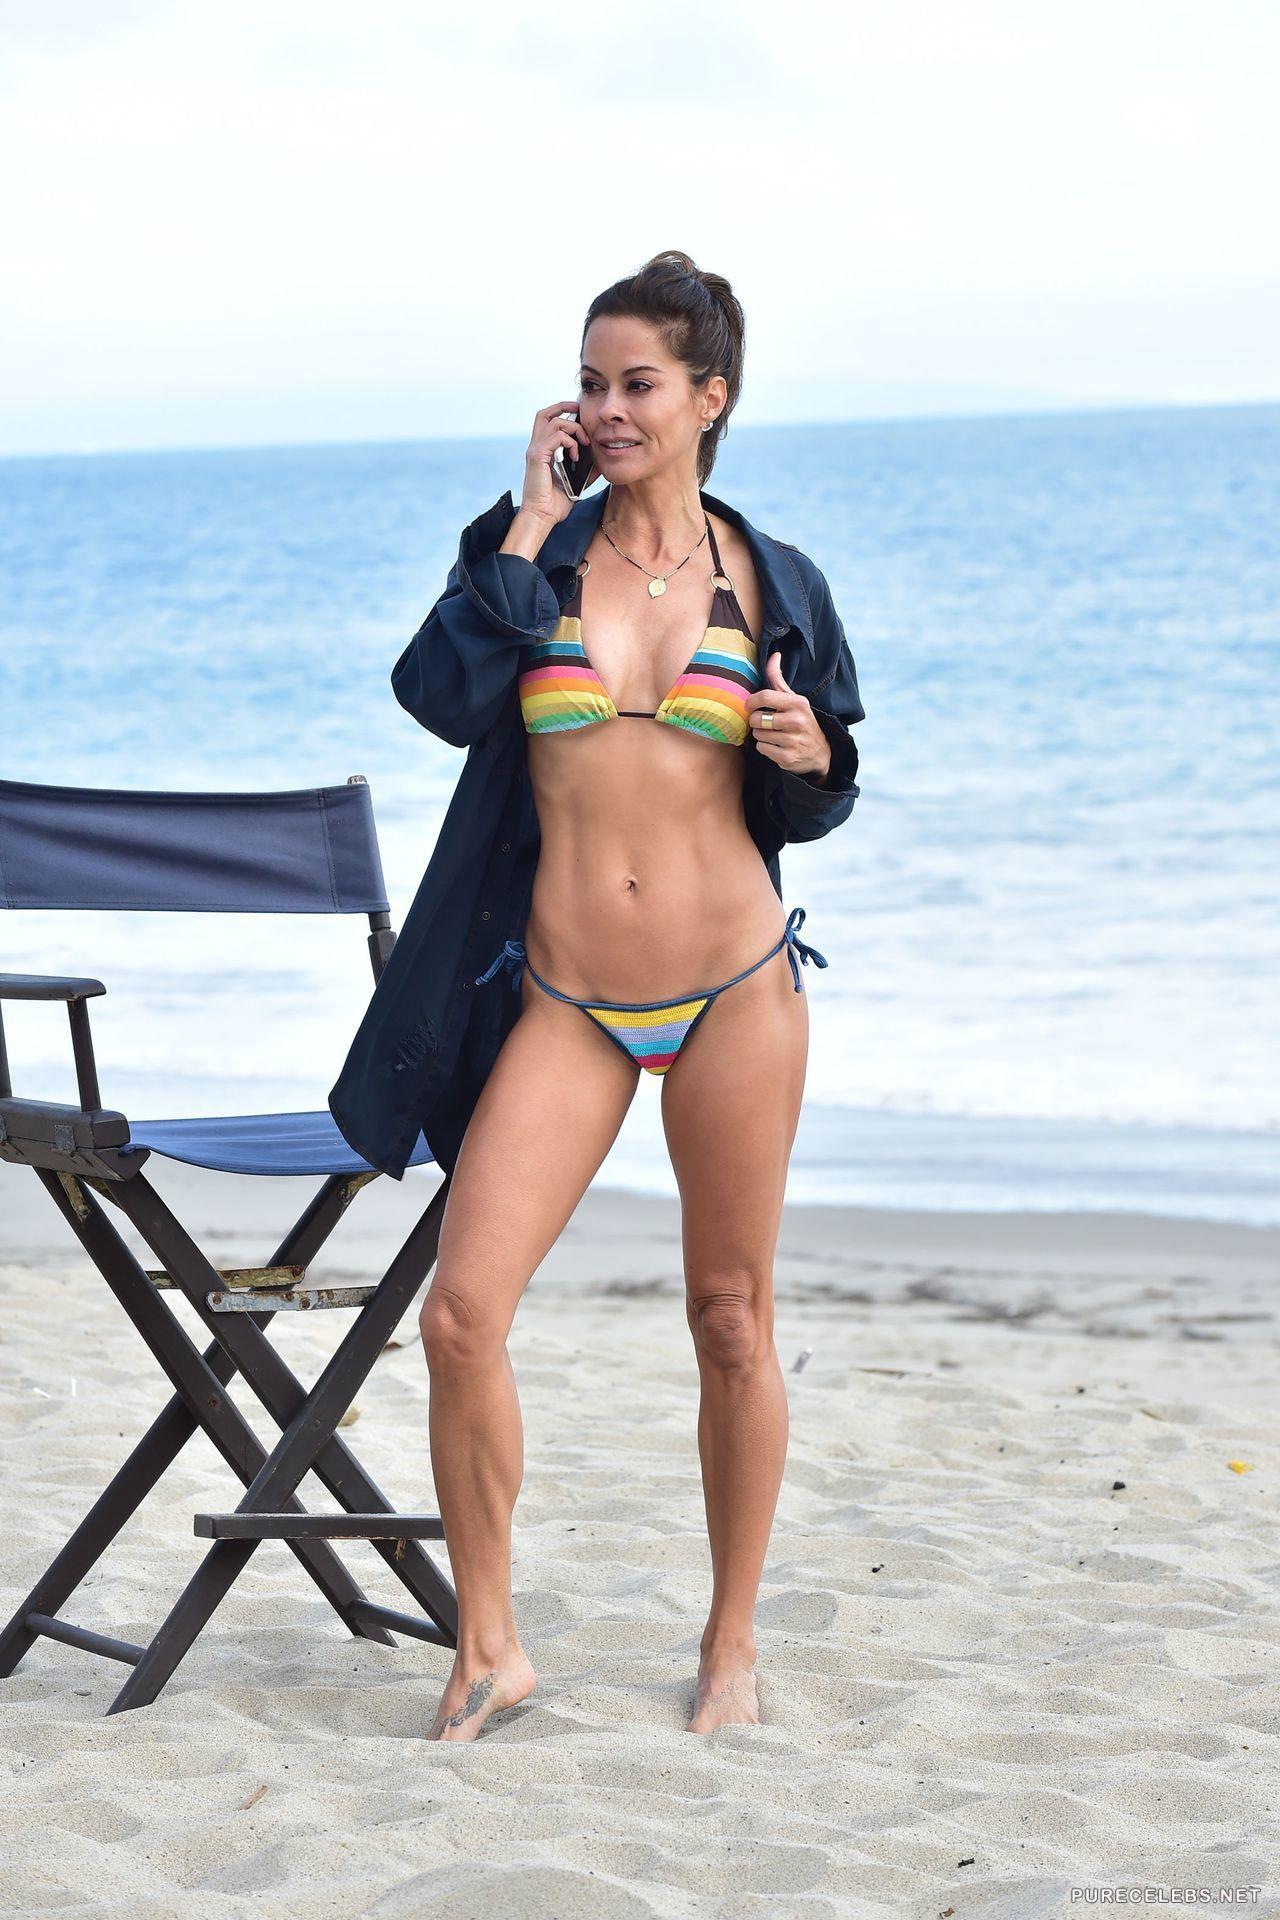 49 yr old cougar Brooke Burke showing off dynamite body in